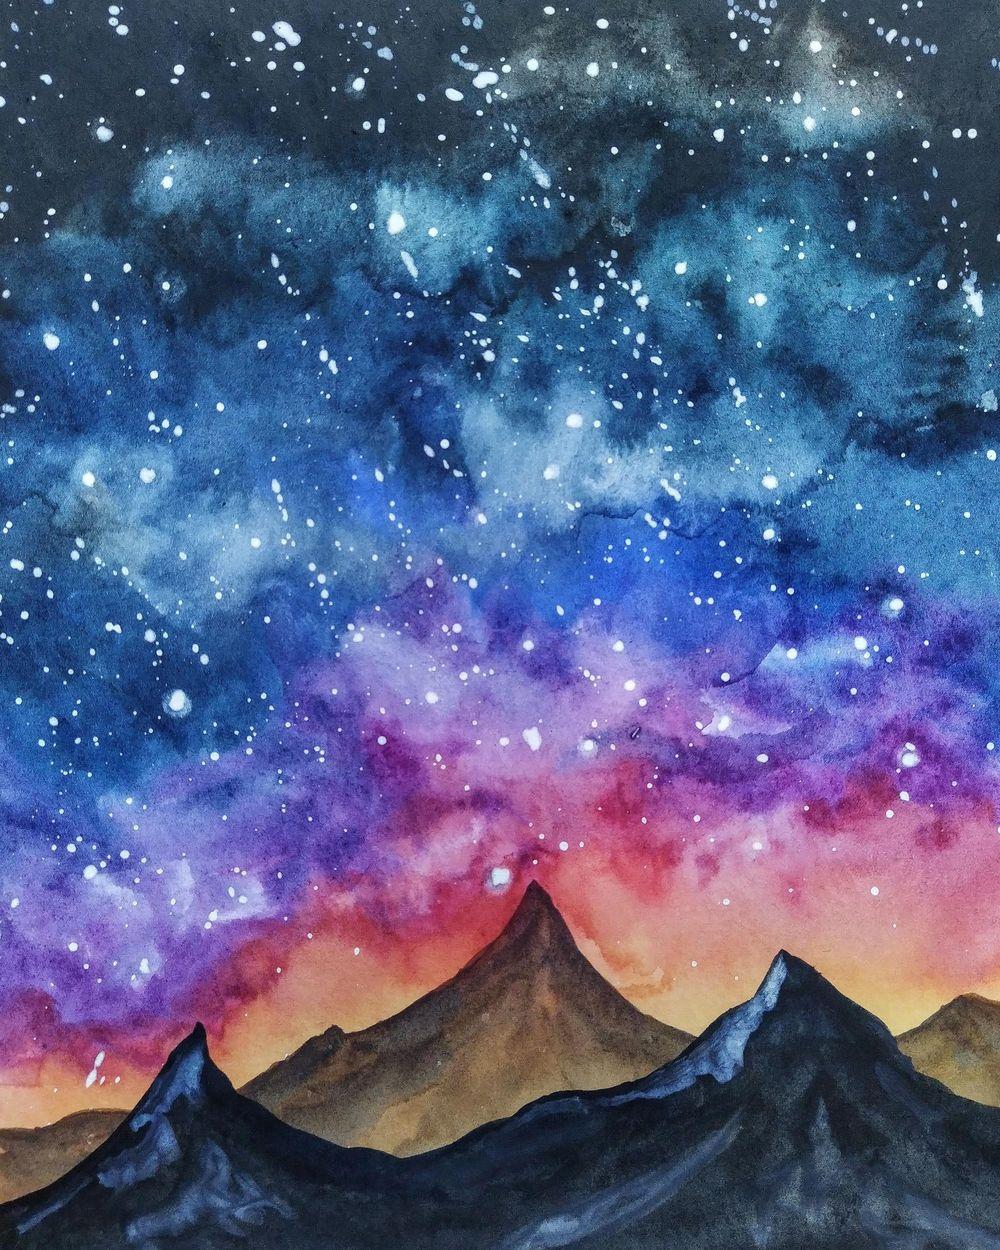 Night Galaxy - image 1 - student project